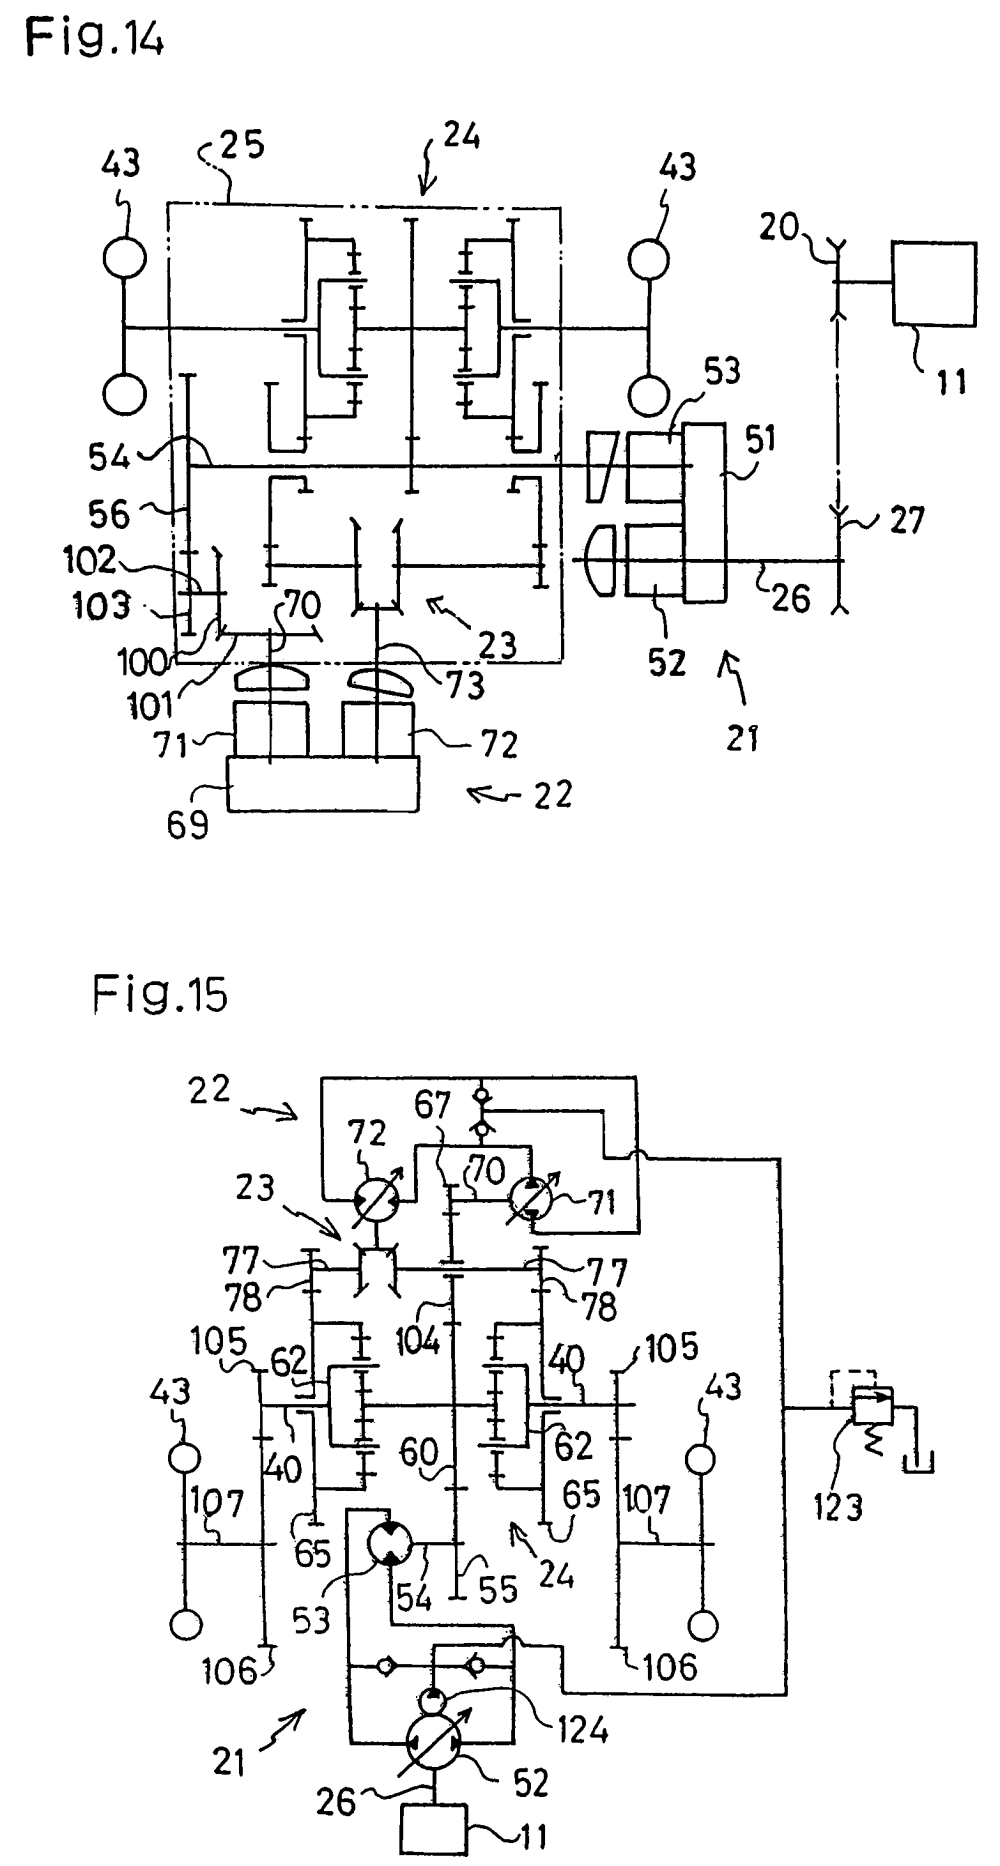 medium resolution of dixon zero turn mower wiring diagram wiring diagramdixon lawn mower wiring diagram wiring schematic diagramdixon mower